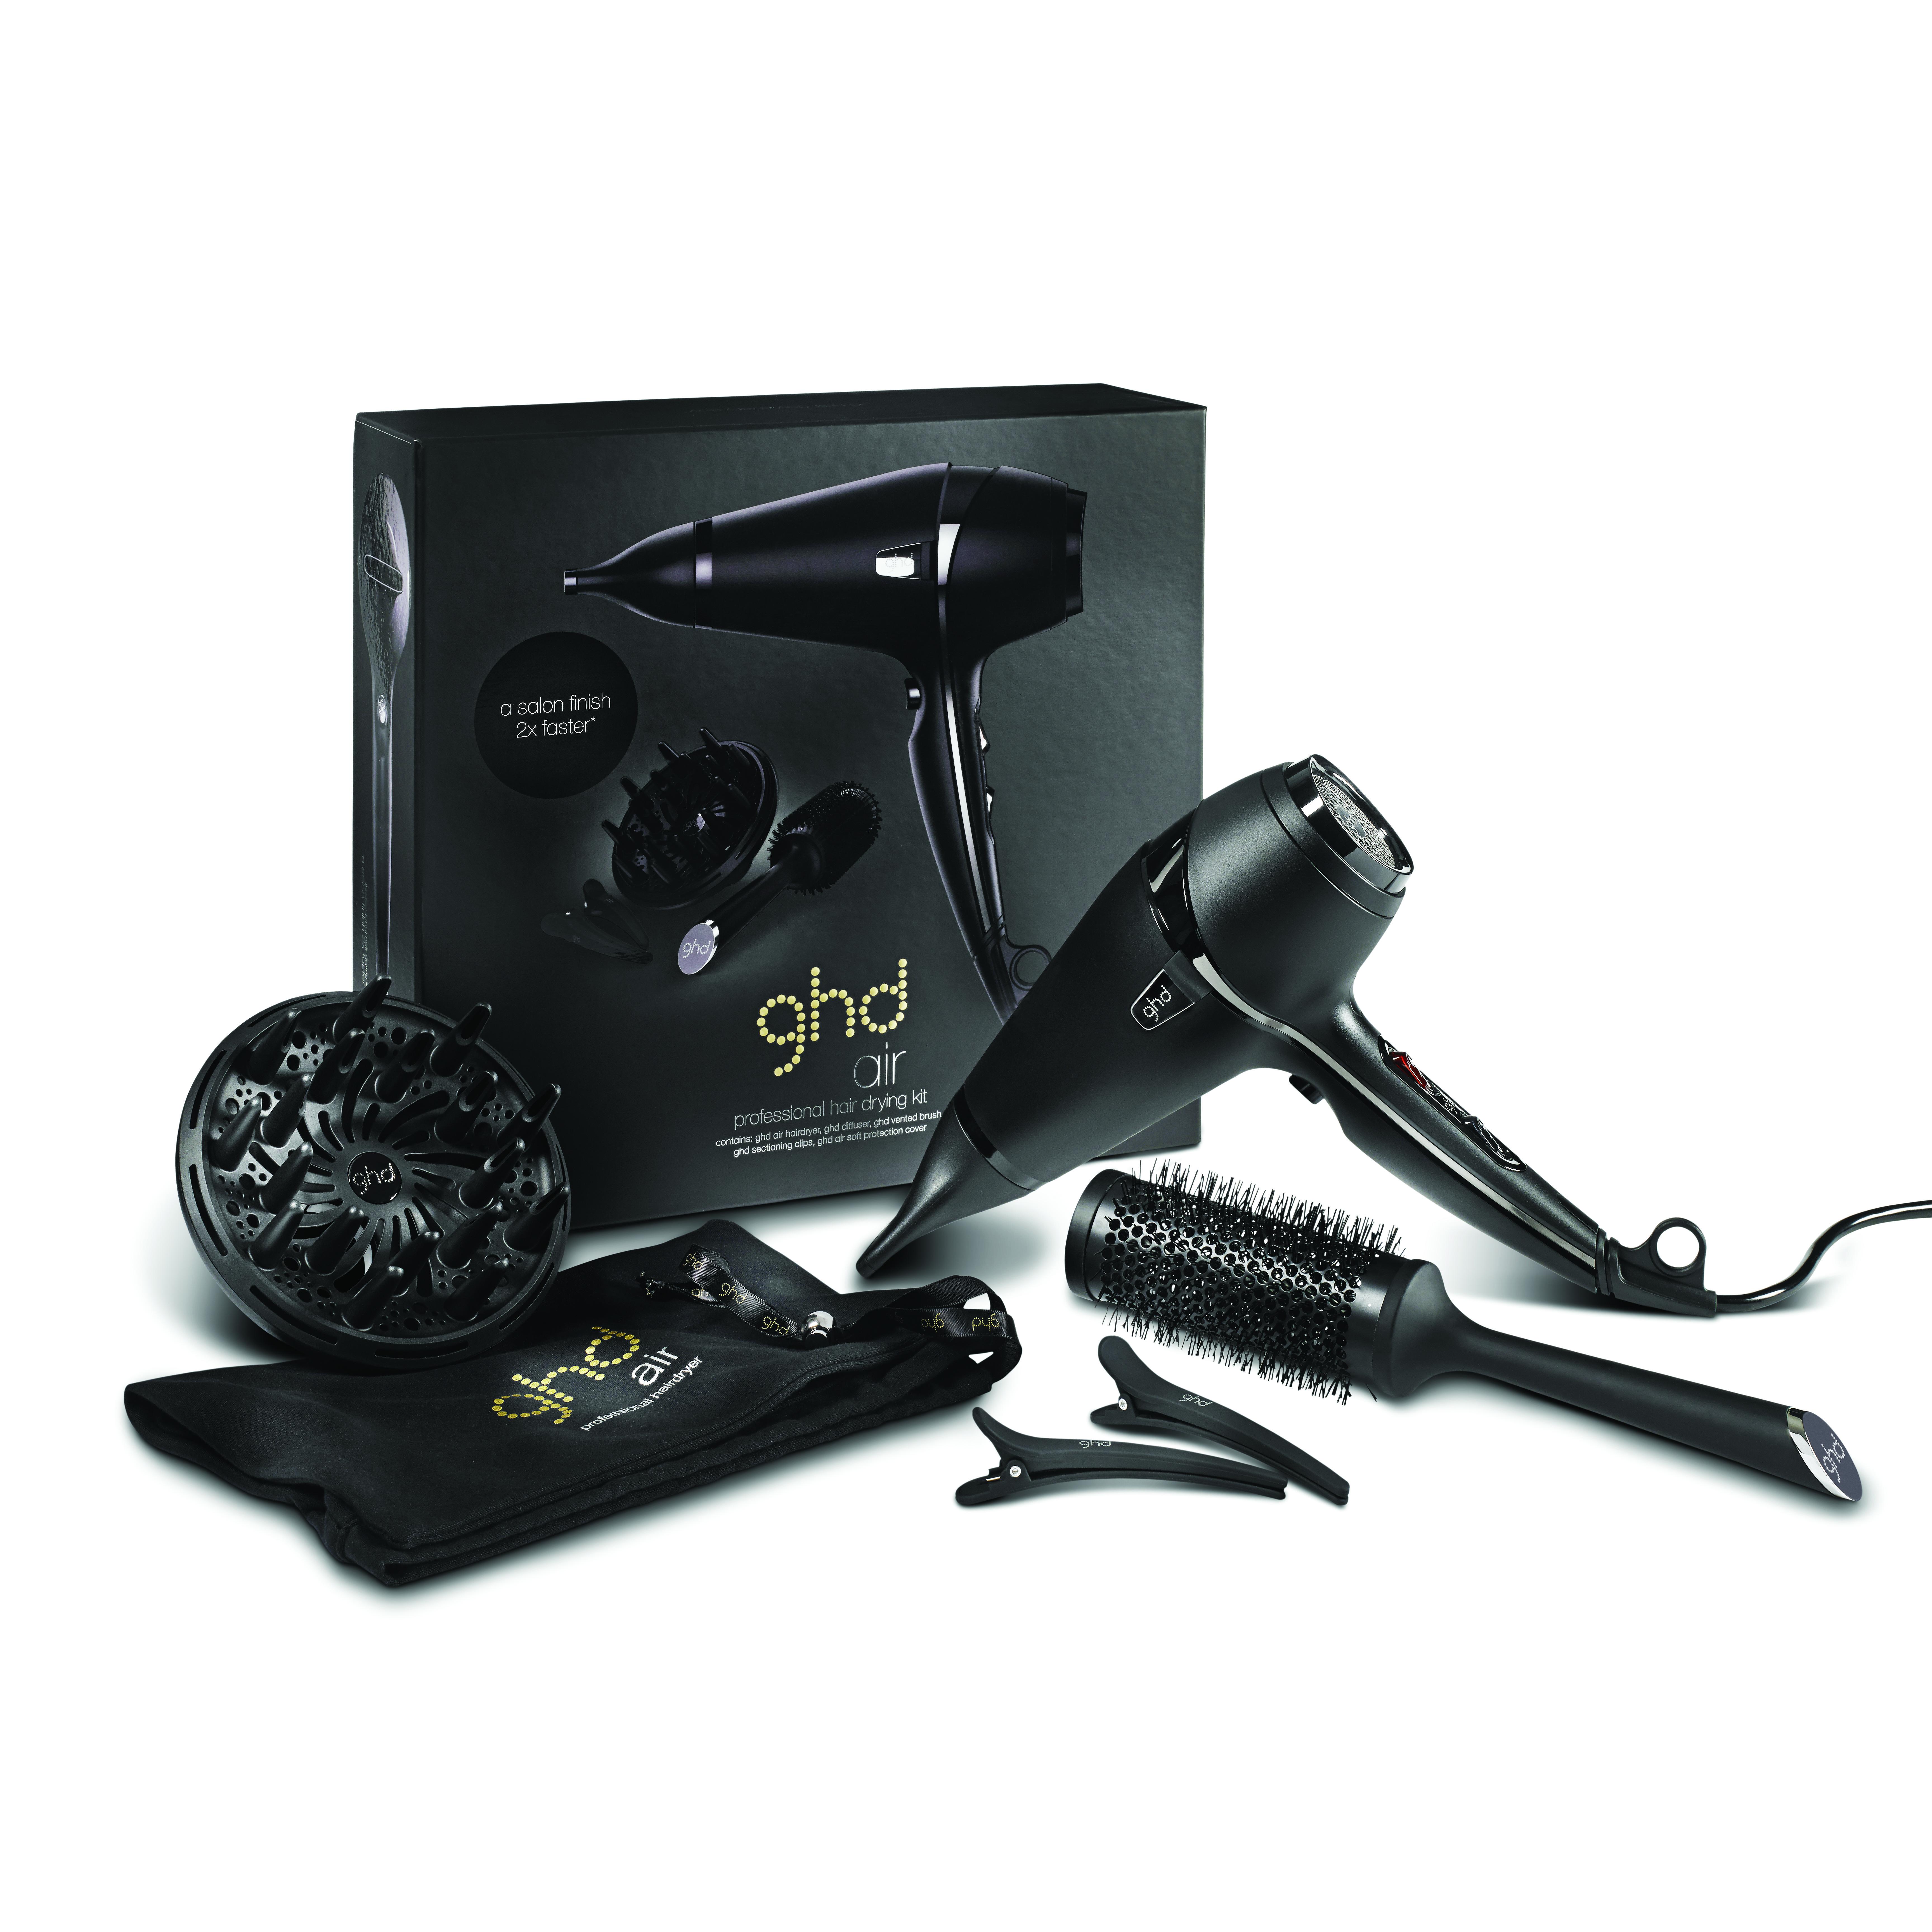 GHD Фен для сушки и укладки волос GHD Air Hairdryer 2100 W в наборе (фен с соплом + насадка диффузор, керамическая круглая щетка, 2 зажима, мягкая сумка) фото